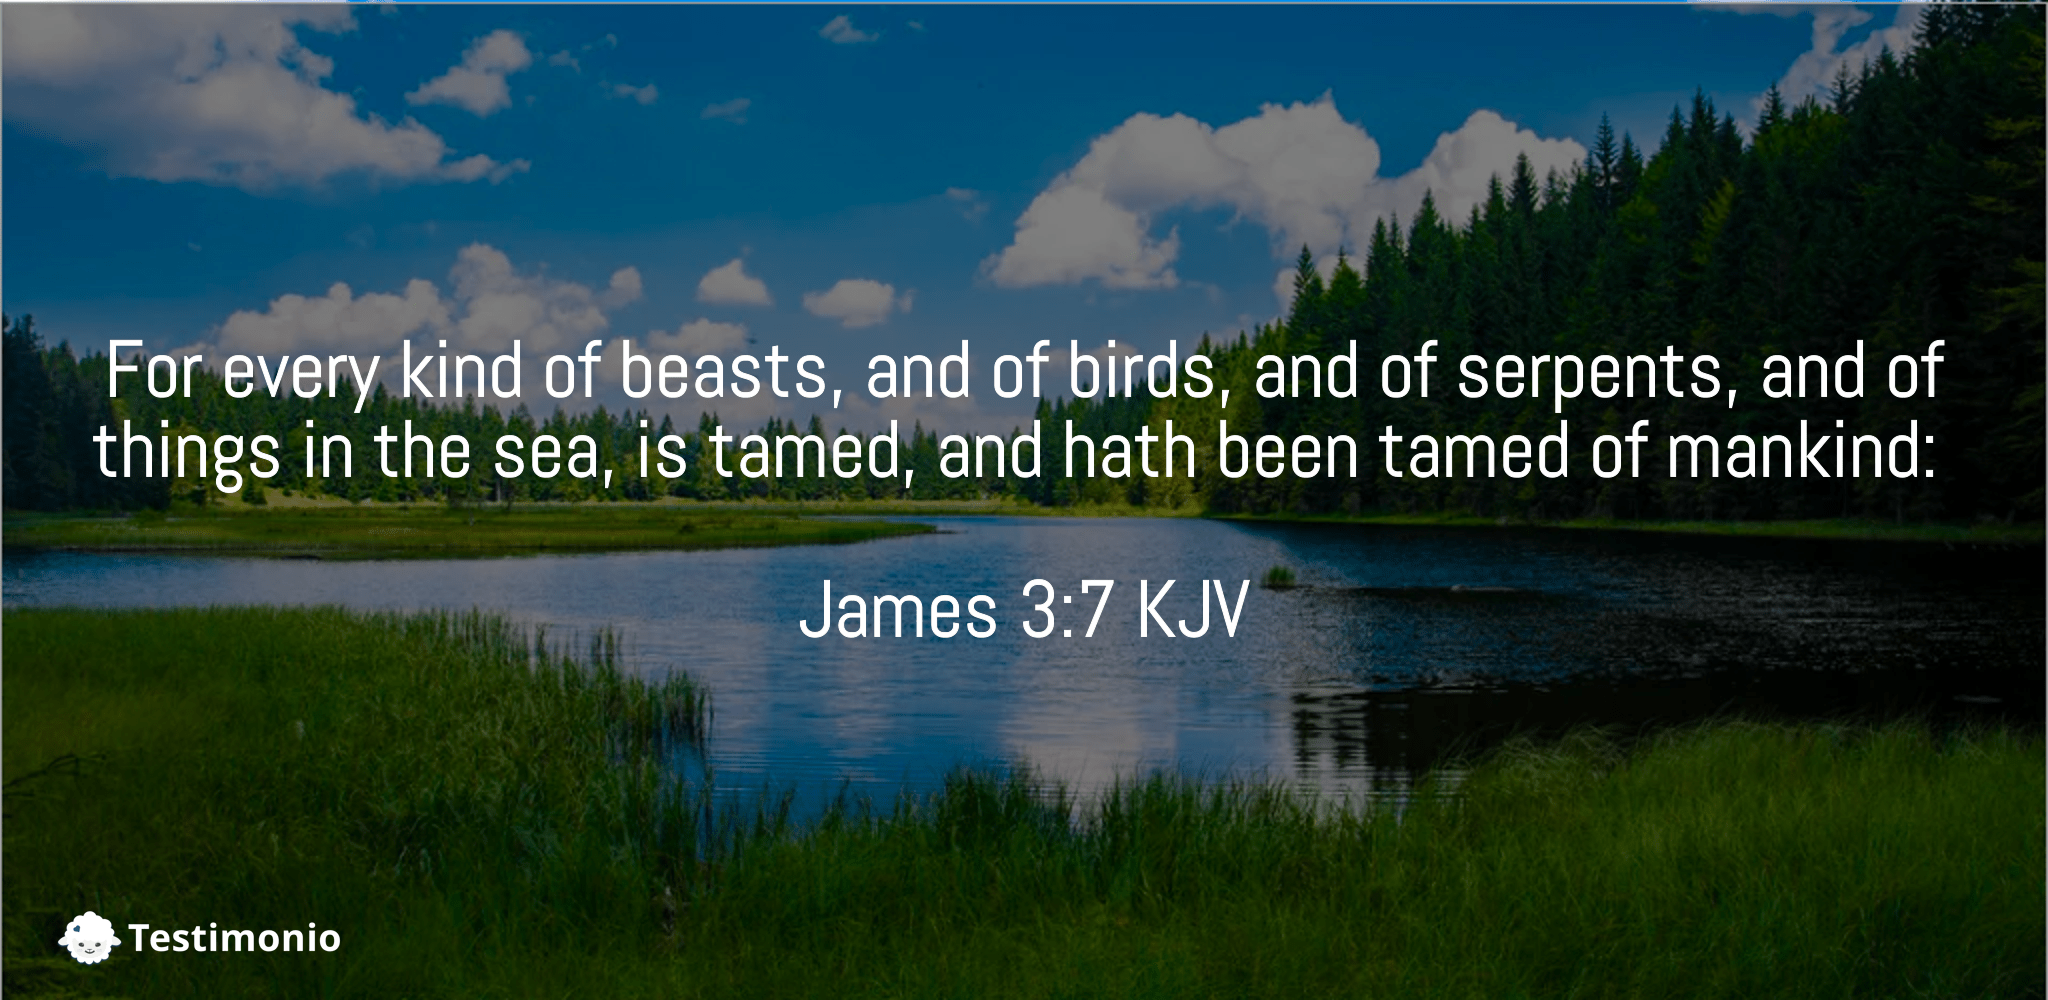 James 3:7